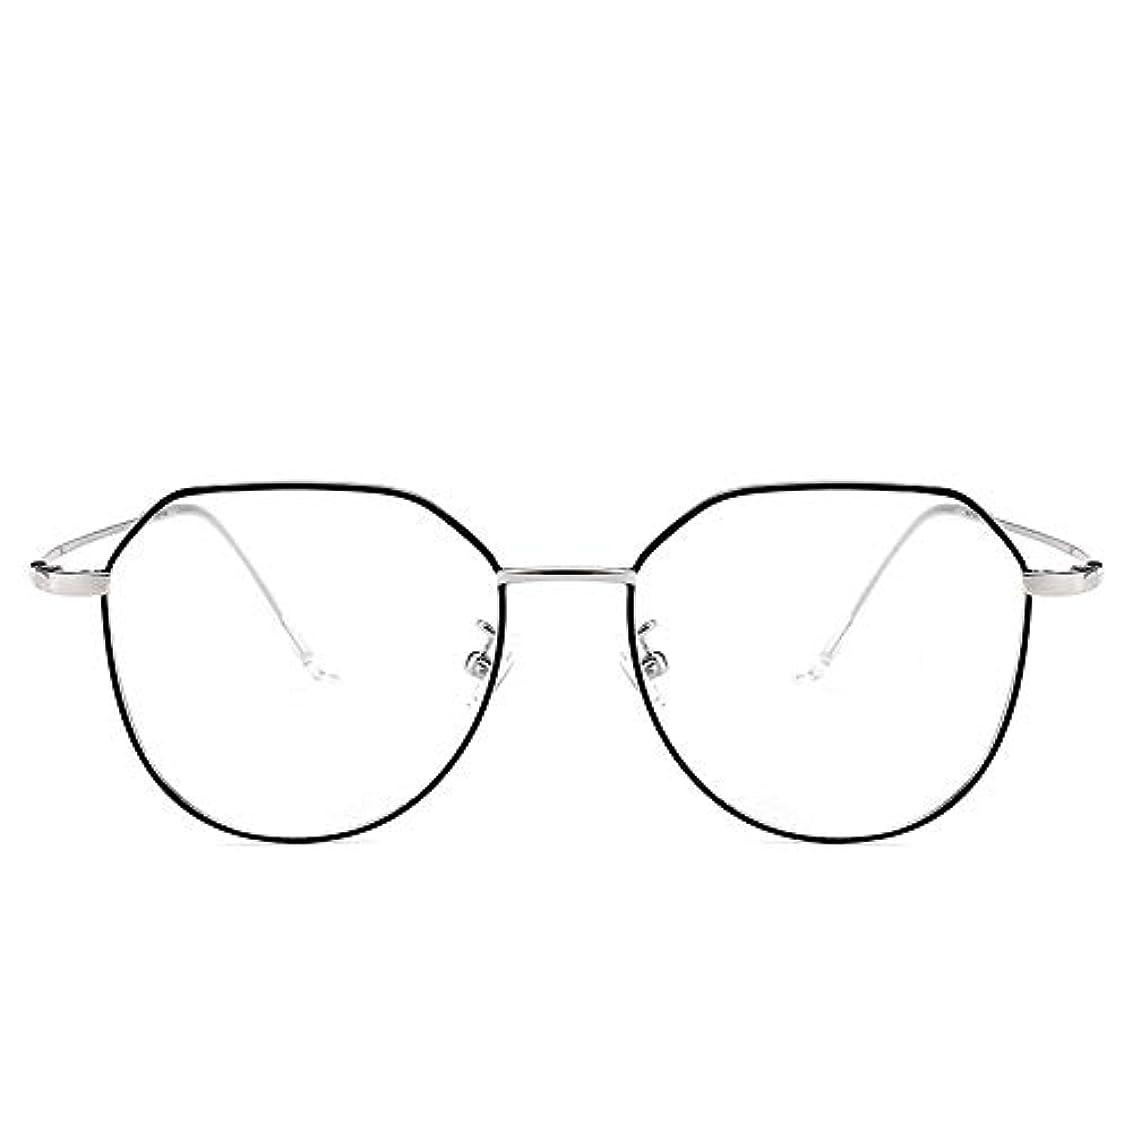 Mocici 不規則な 金属眼鏡 フレーム アンチ ブルー レイ コンピュータ ゲームメガネ 男と女 レンズ 男と女 老眼鏡